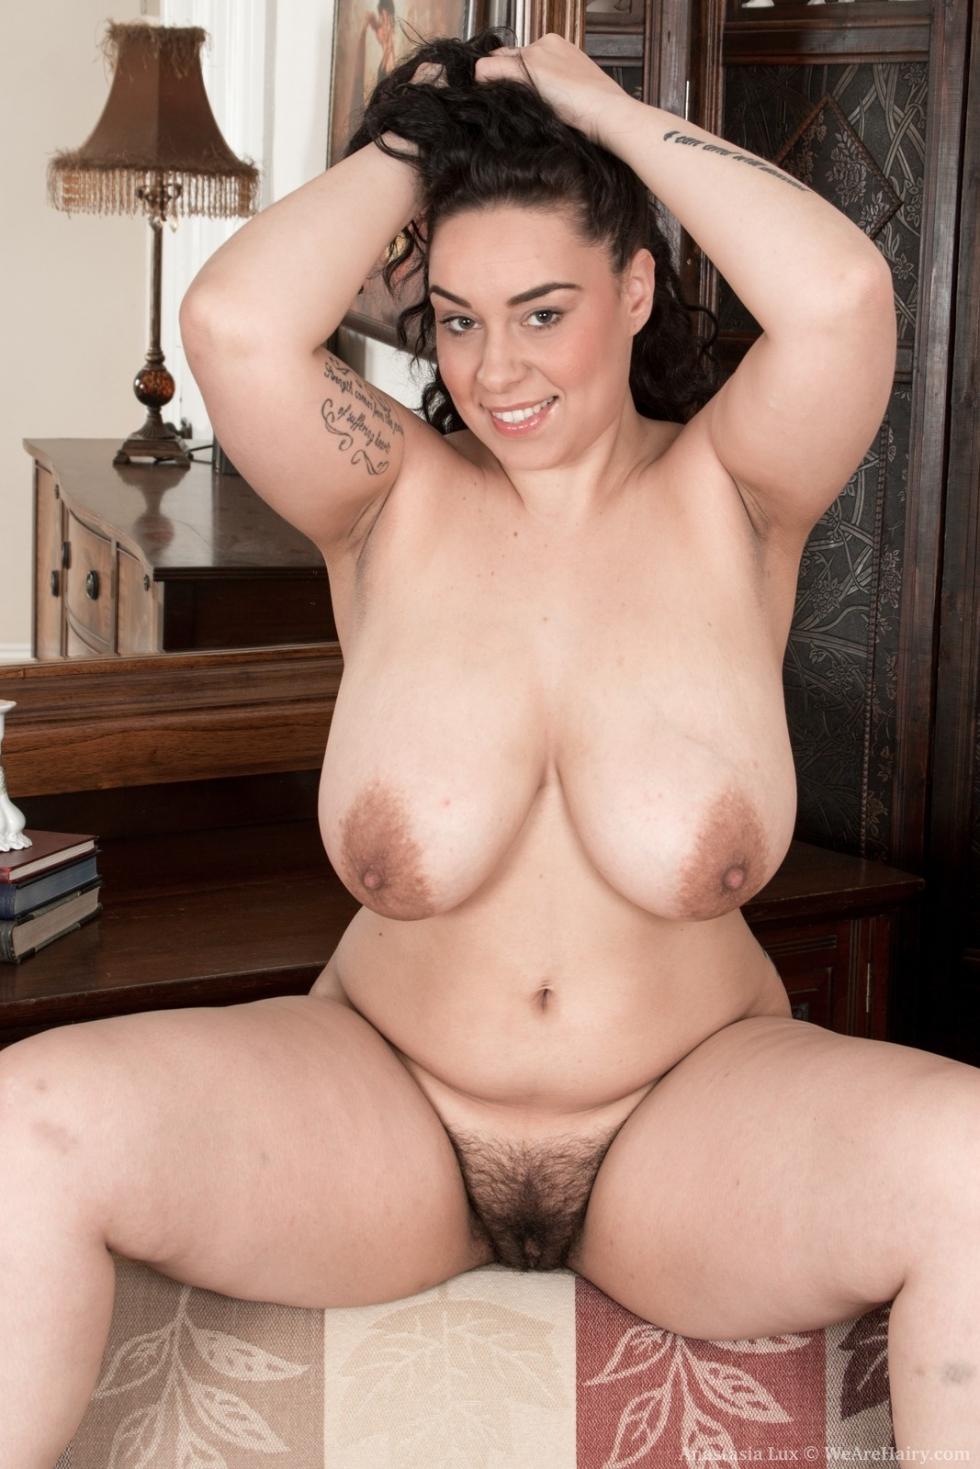 xl åbyhøj escort store bryster